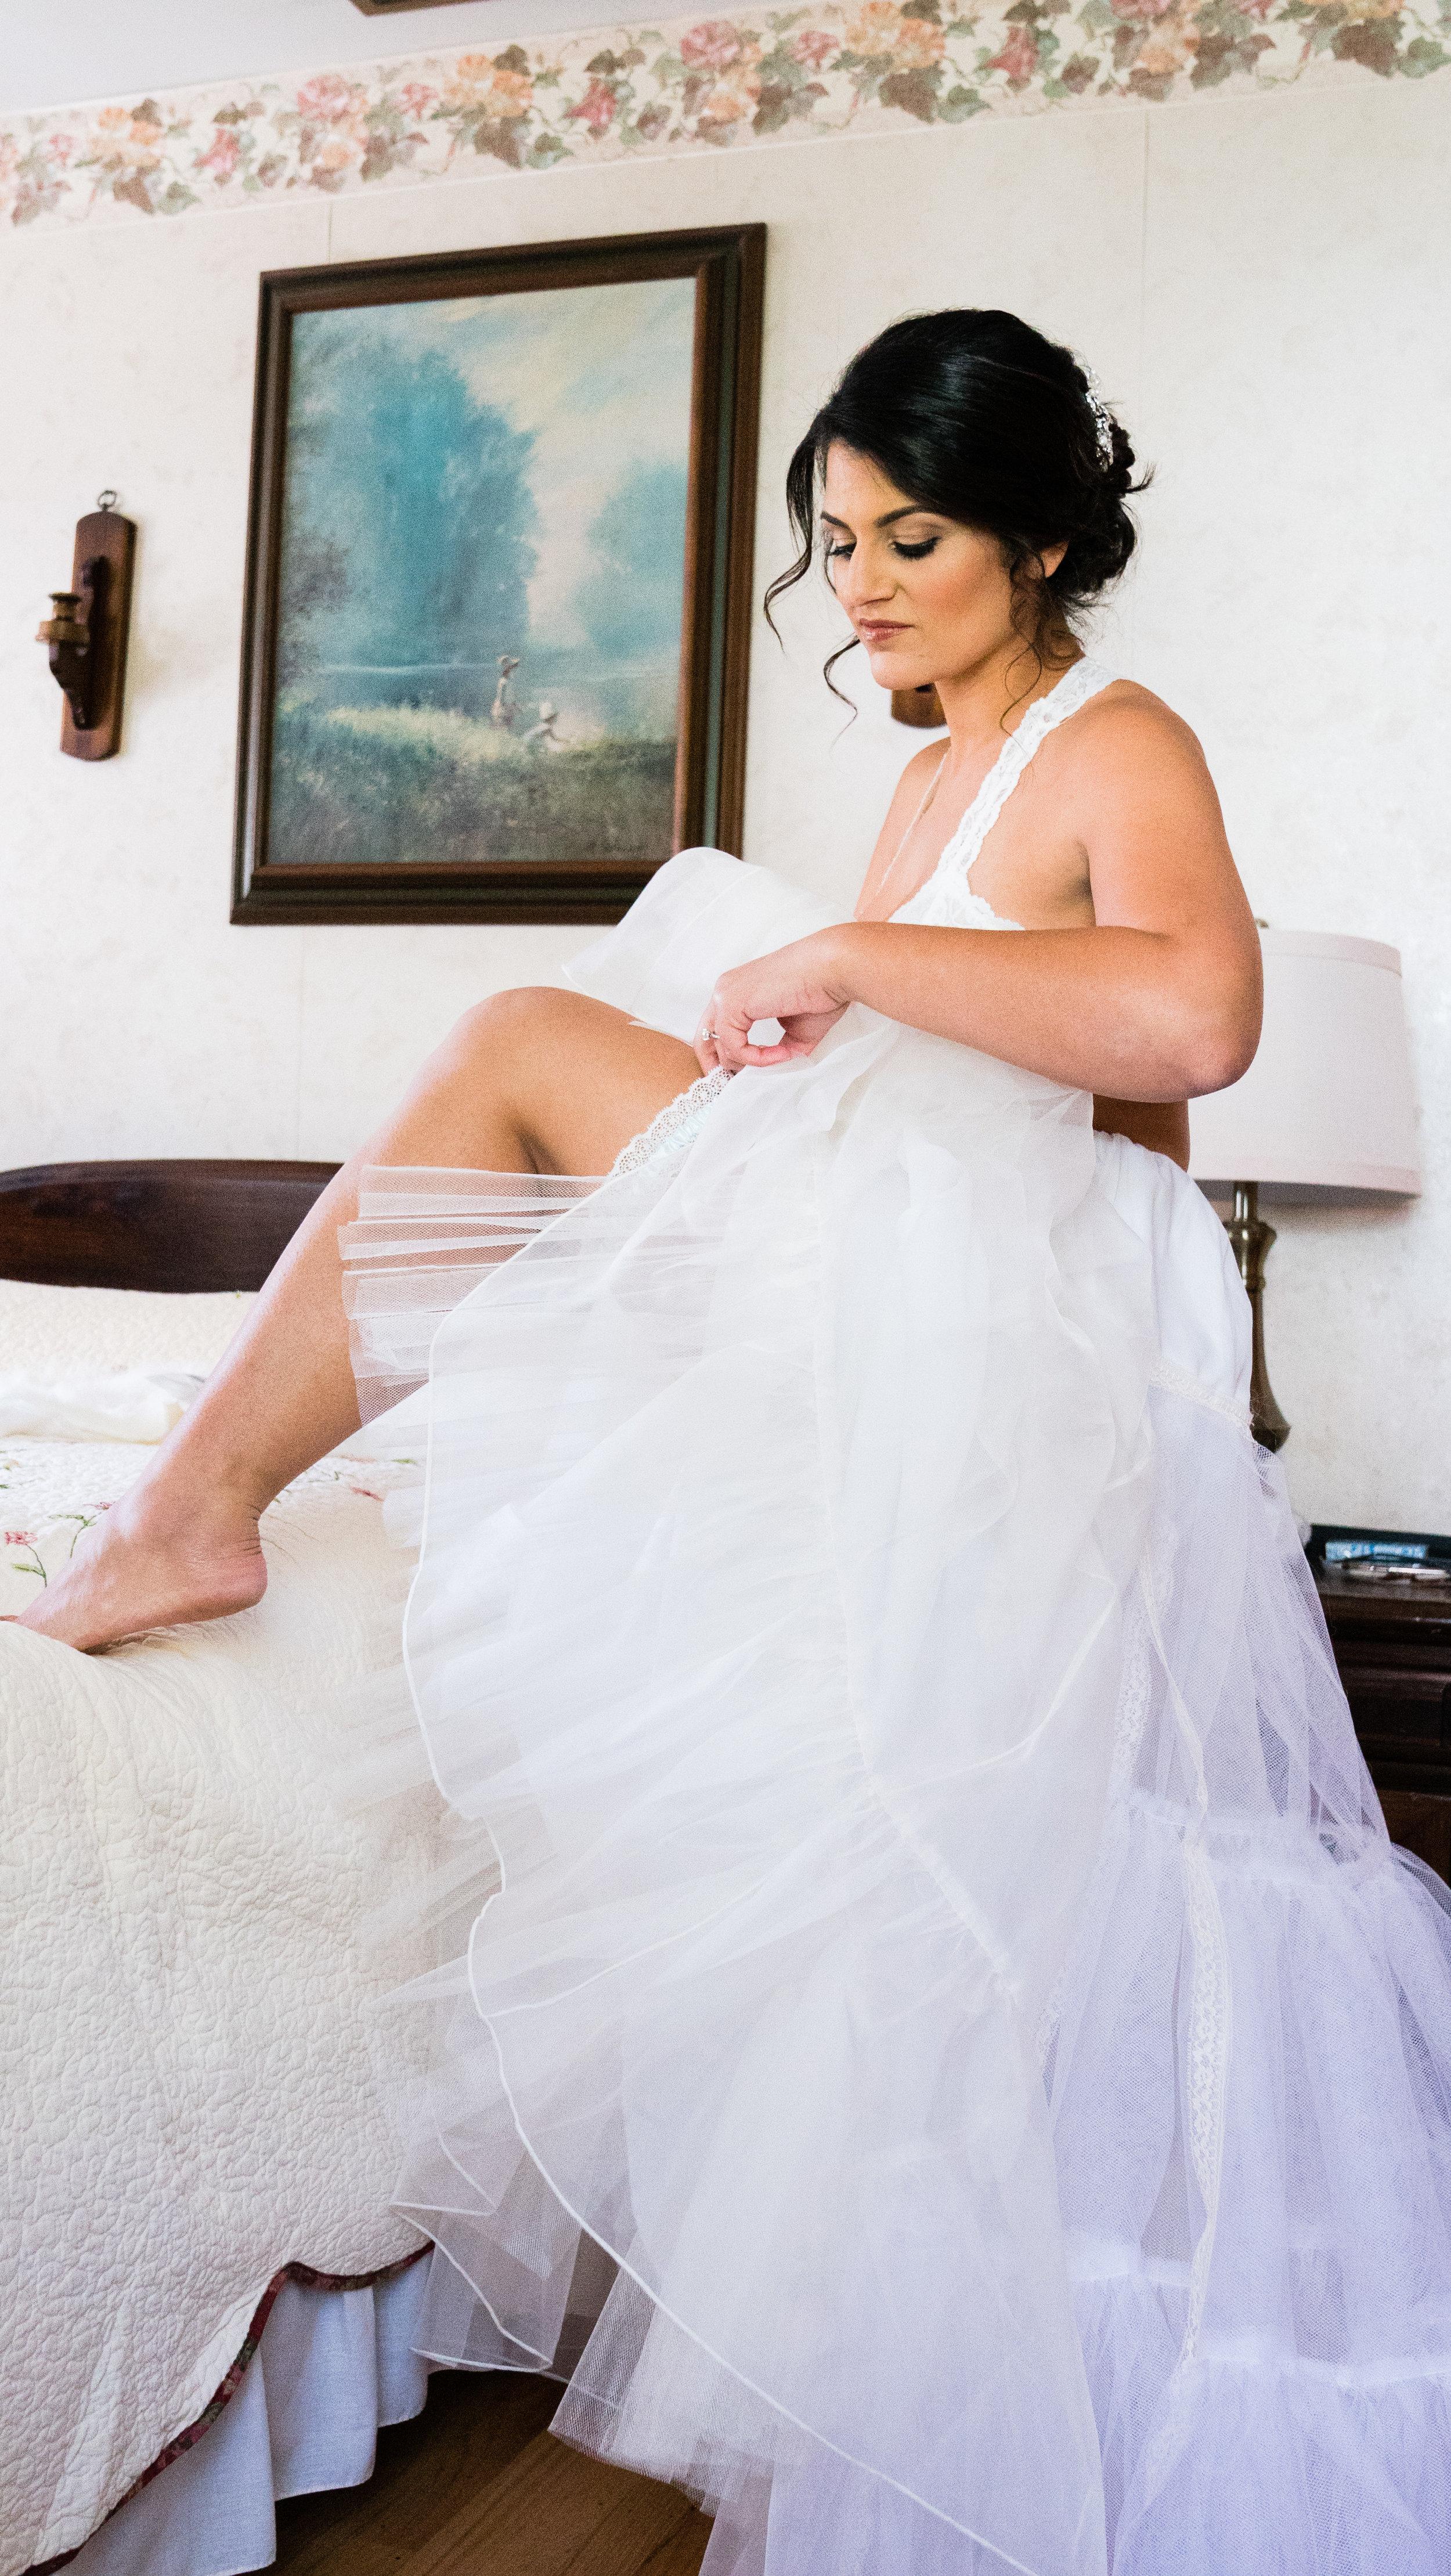 Luciens Manor Wedding Photos - 015.jpg